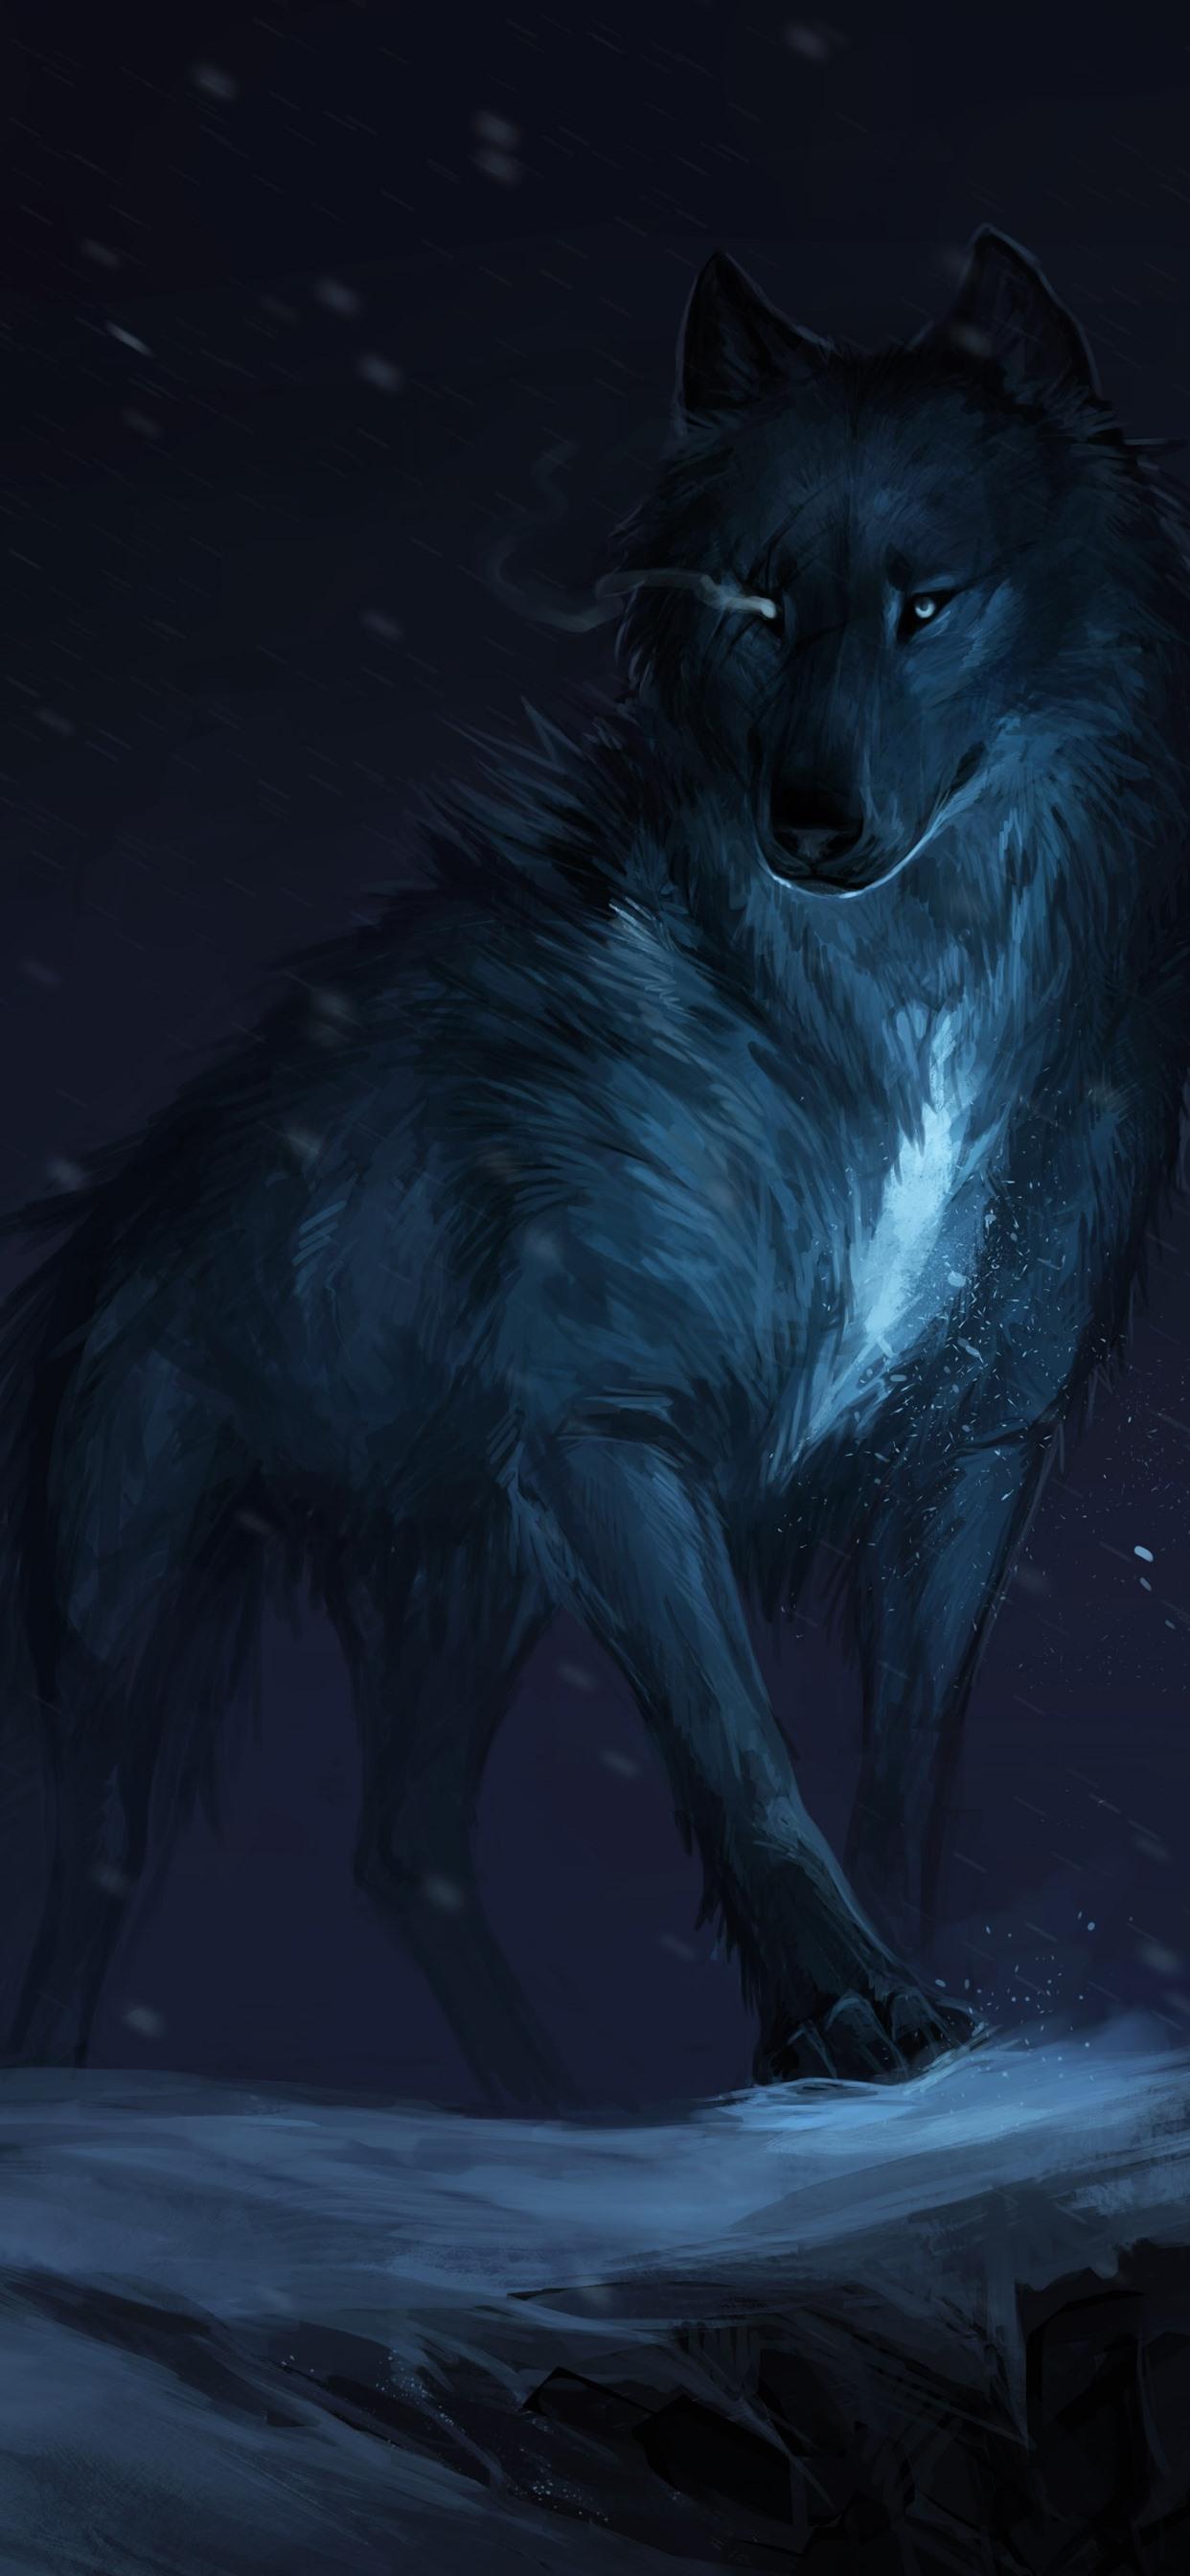 Black Fox Wallpaper Posted By Samantha Cunningham